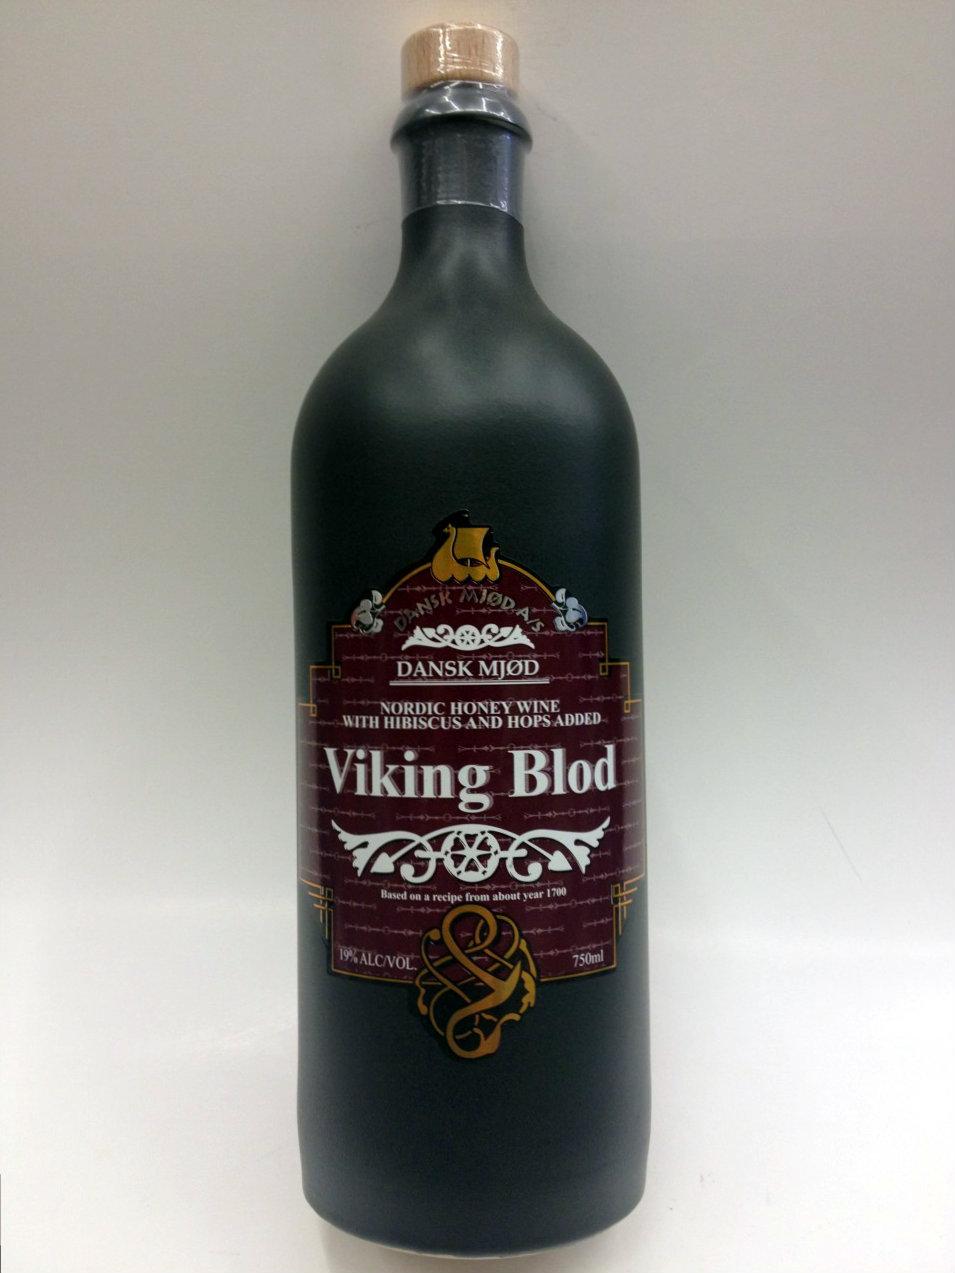 viking_blod__56865-1343620754-1280-1280